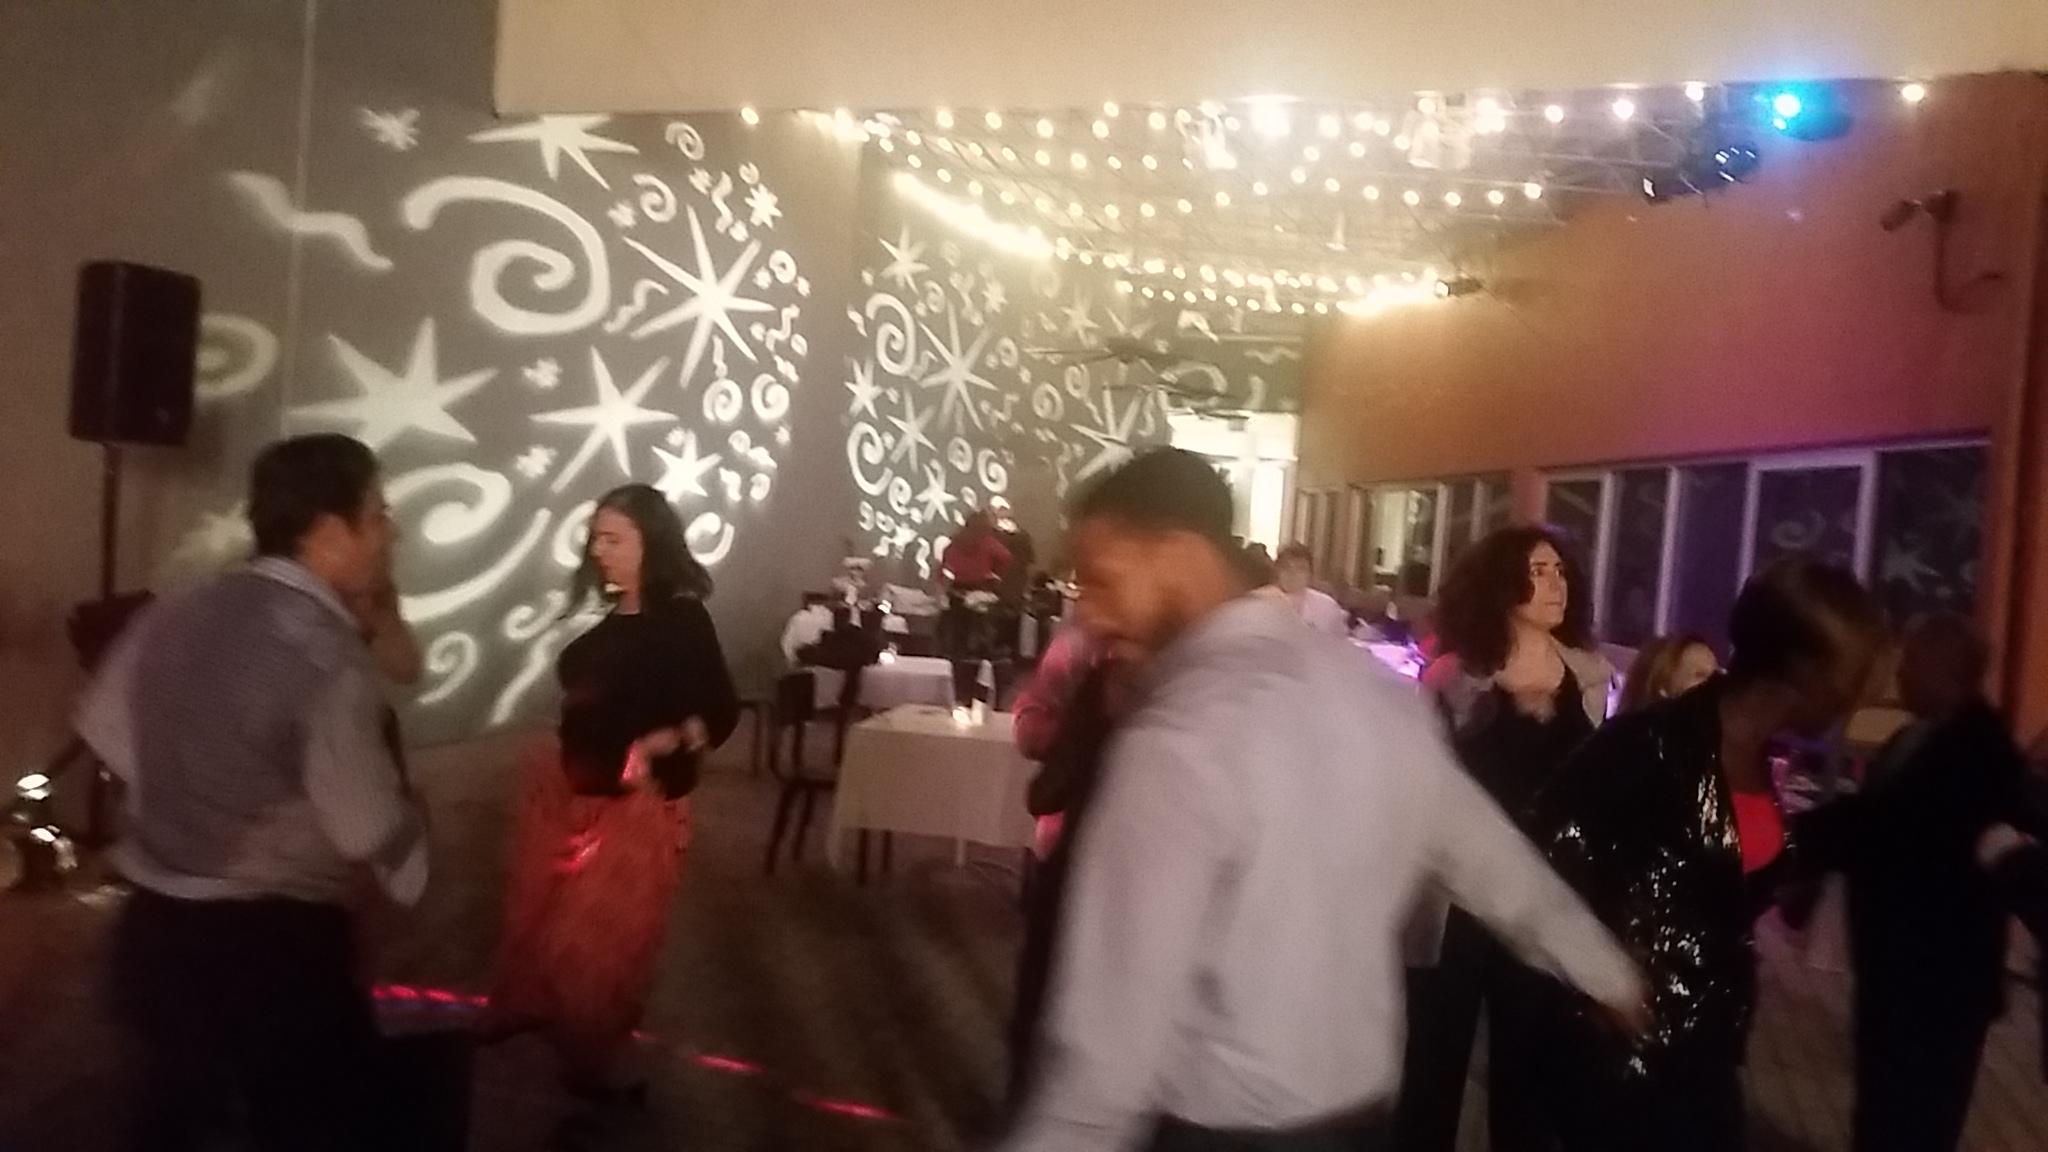 Party at MOCA